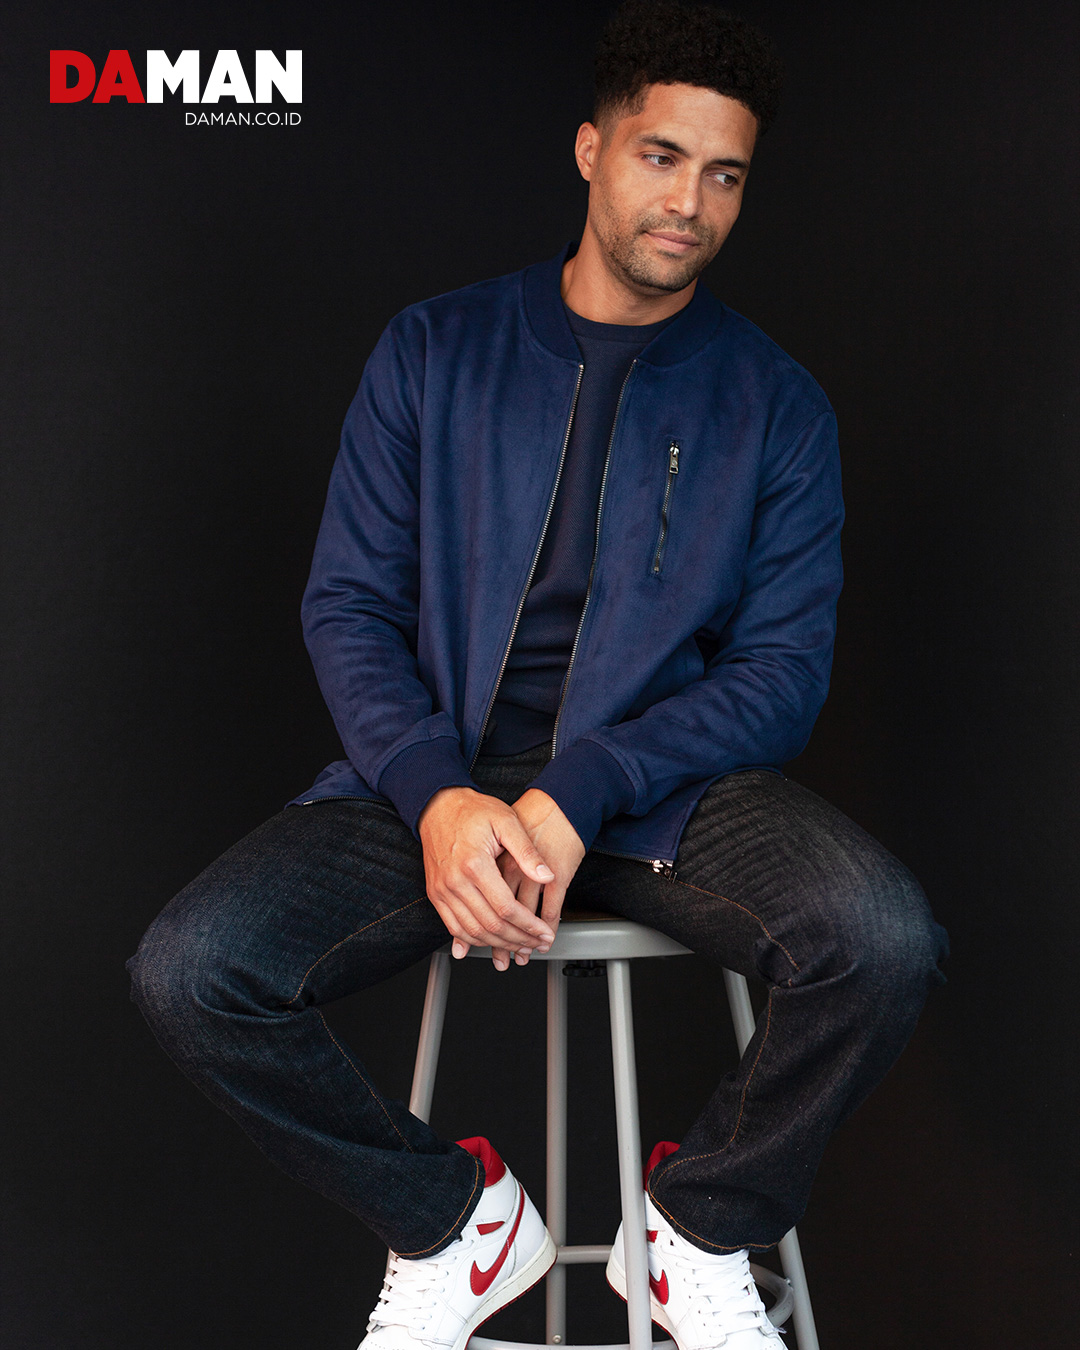 Jacket by Ben Sherman; pants by Polo Ralph Lauren; pullover by John Varvatos; pants by Polo Ralph Lauren; shoes by Nike